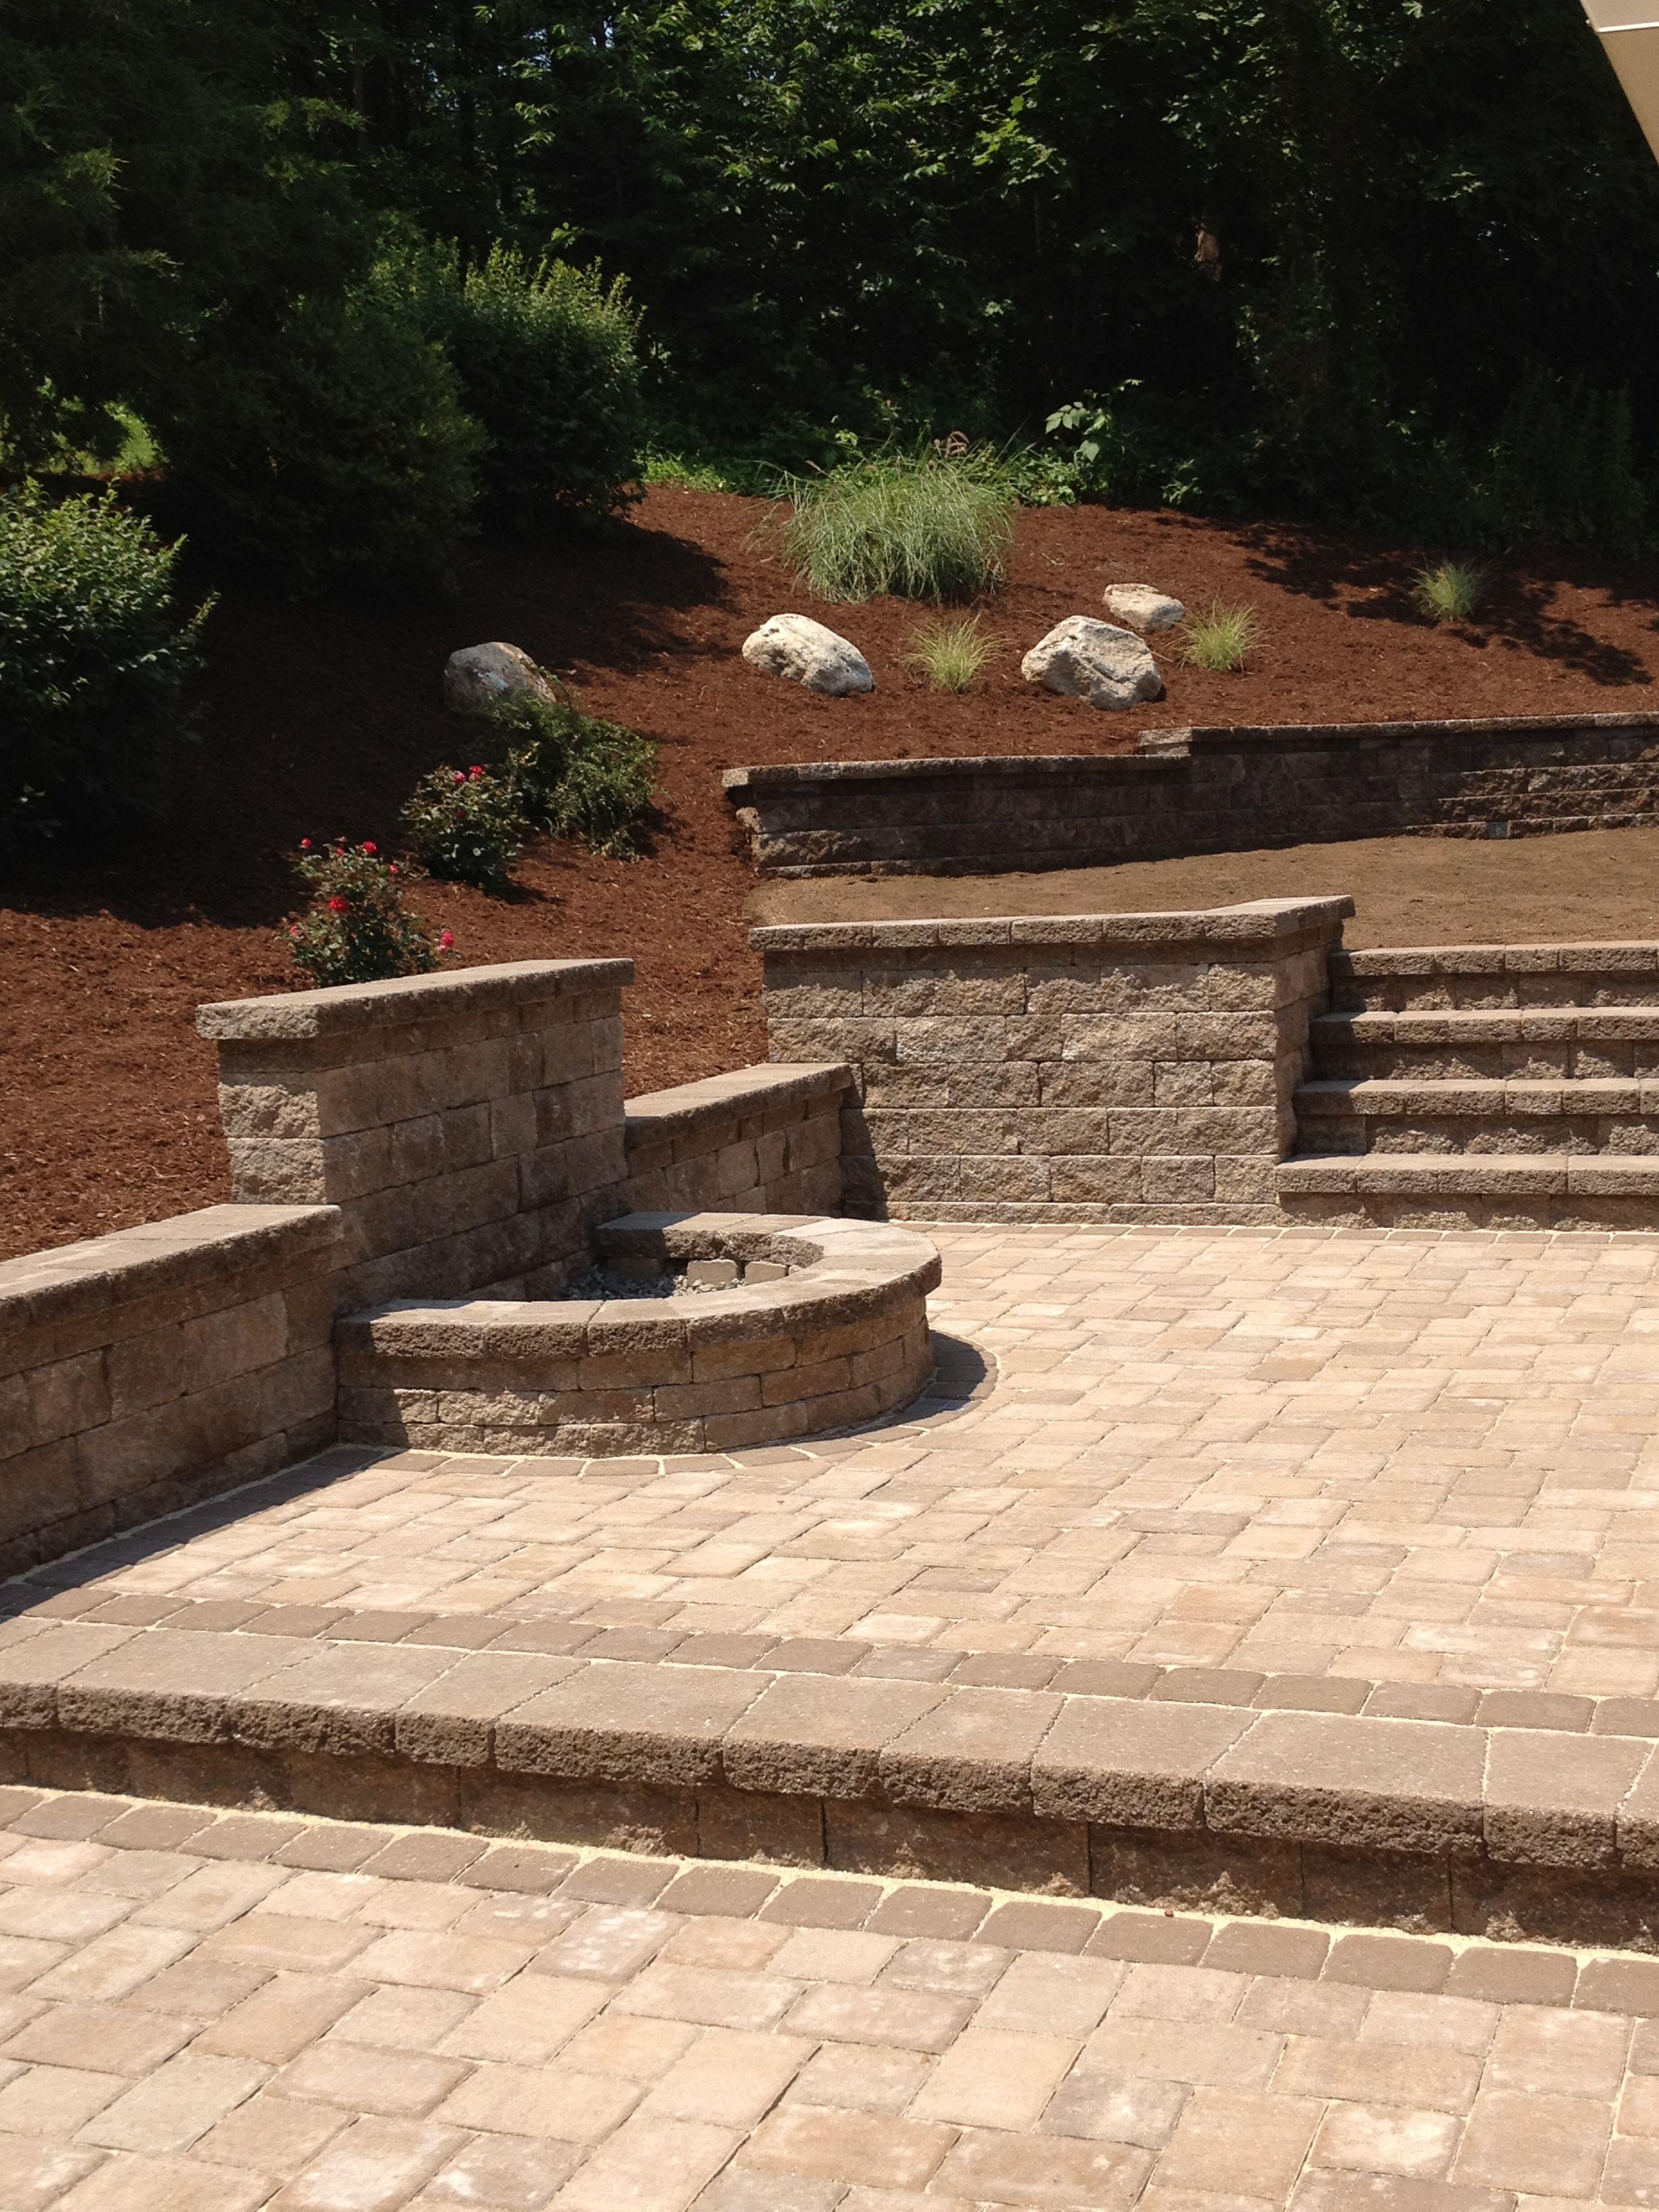 Fire pit borders a mini creta paver patio with retaining walls